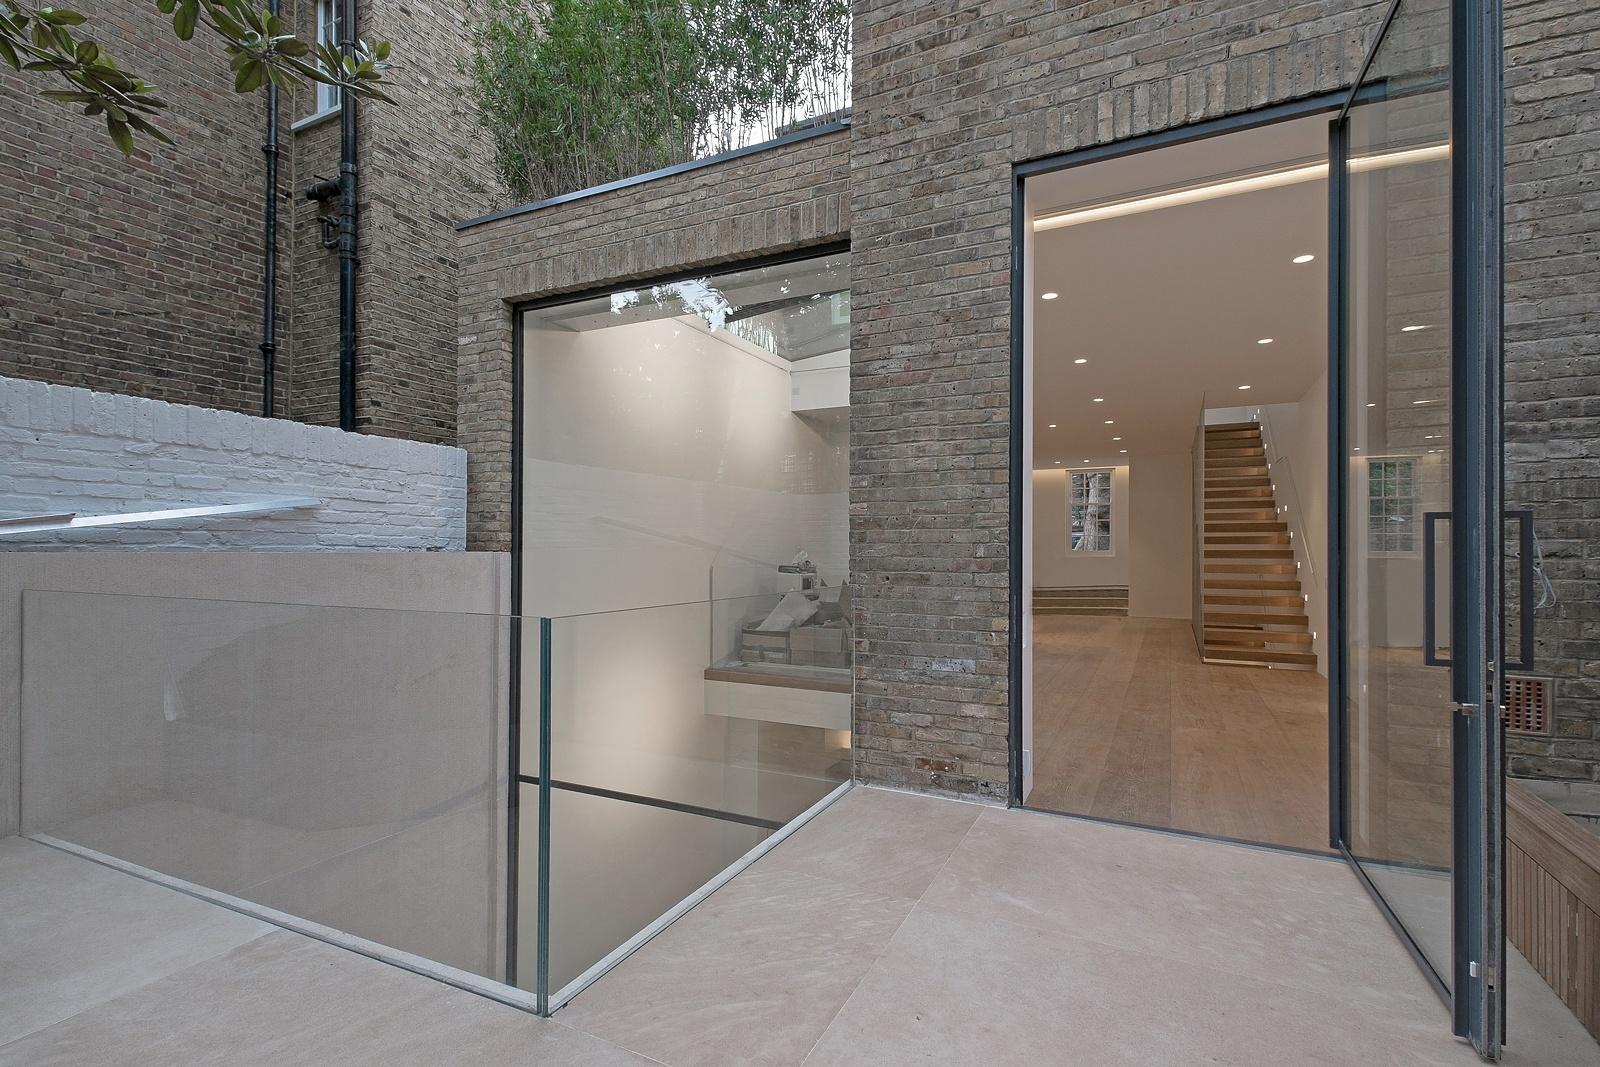 keller minimal pivoting window in london extension